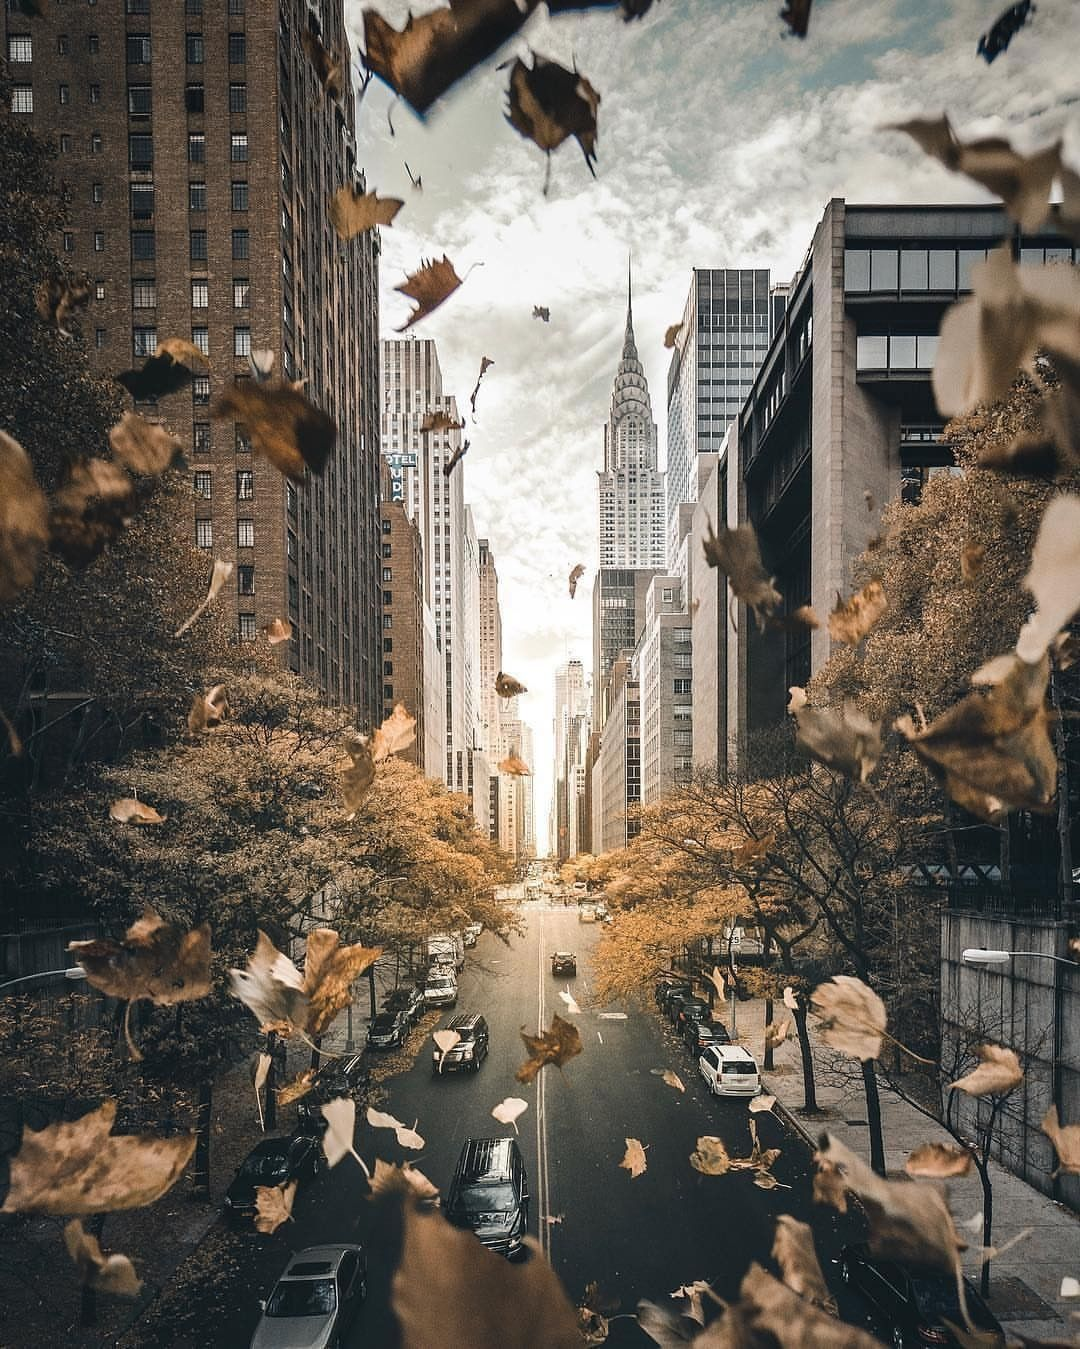 Fall Season Nyc Wallpaper City Wallpaper New York Wallpaper Autumn In New York